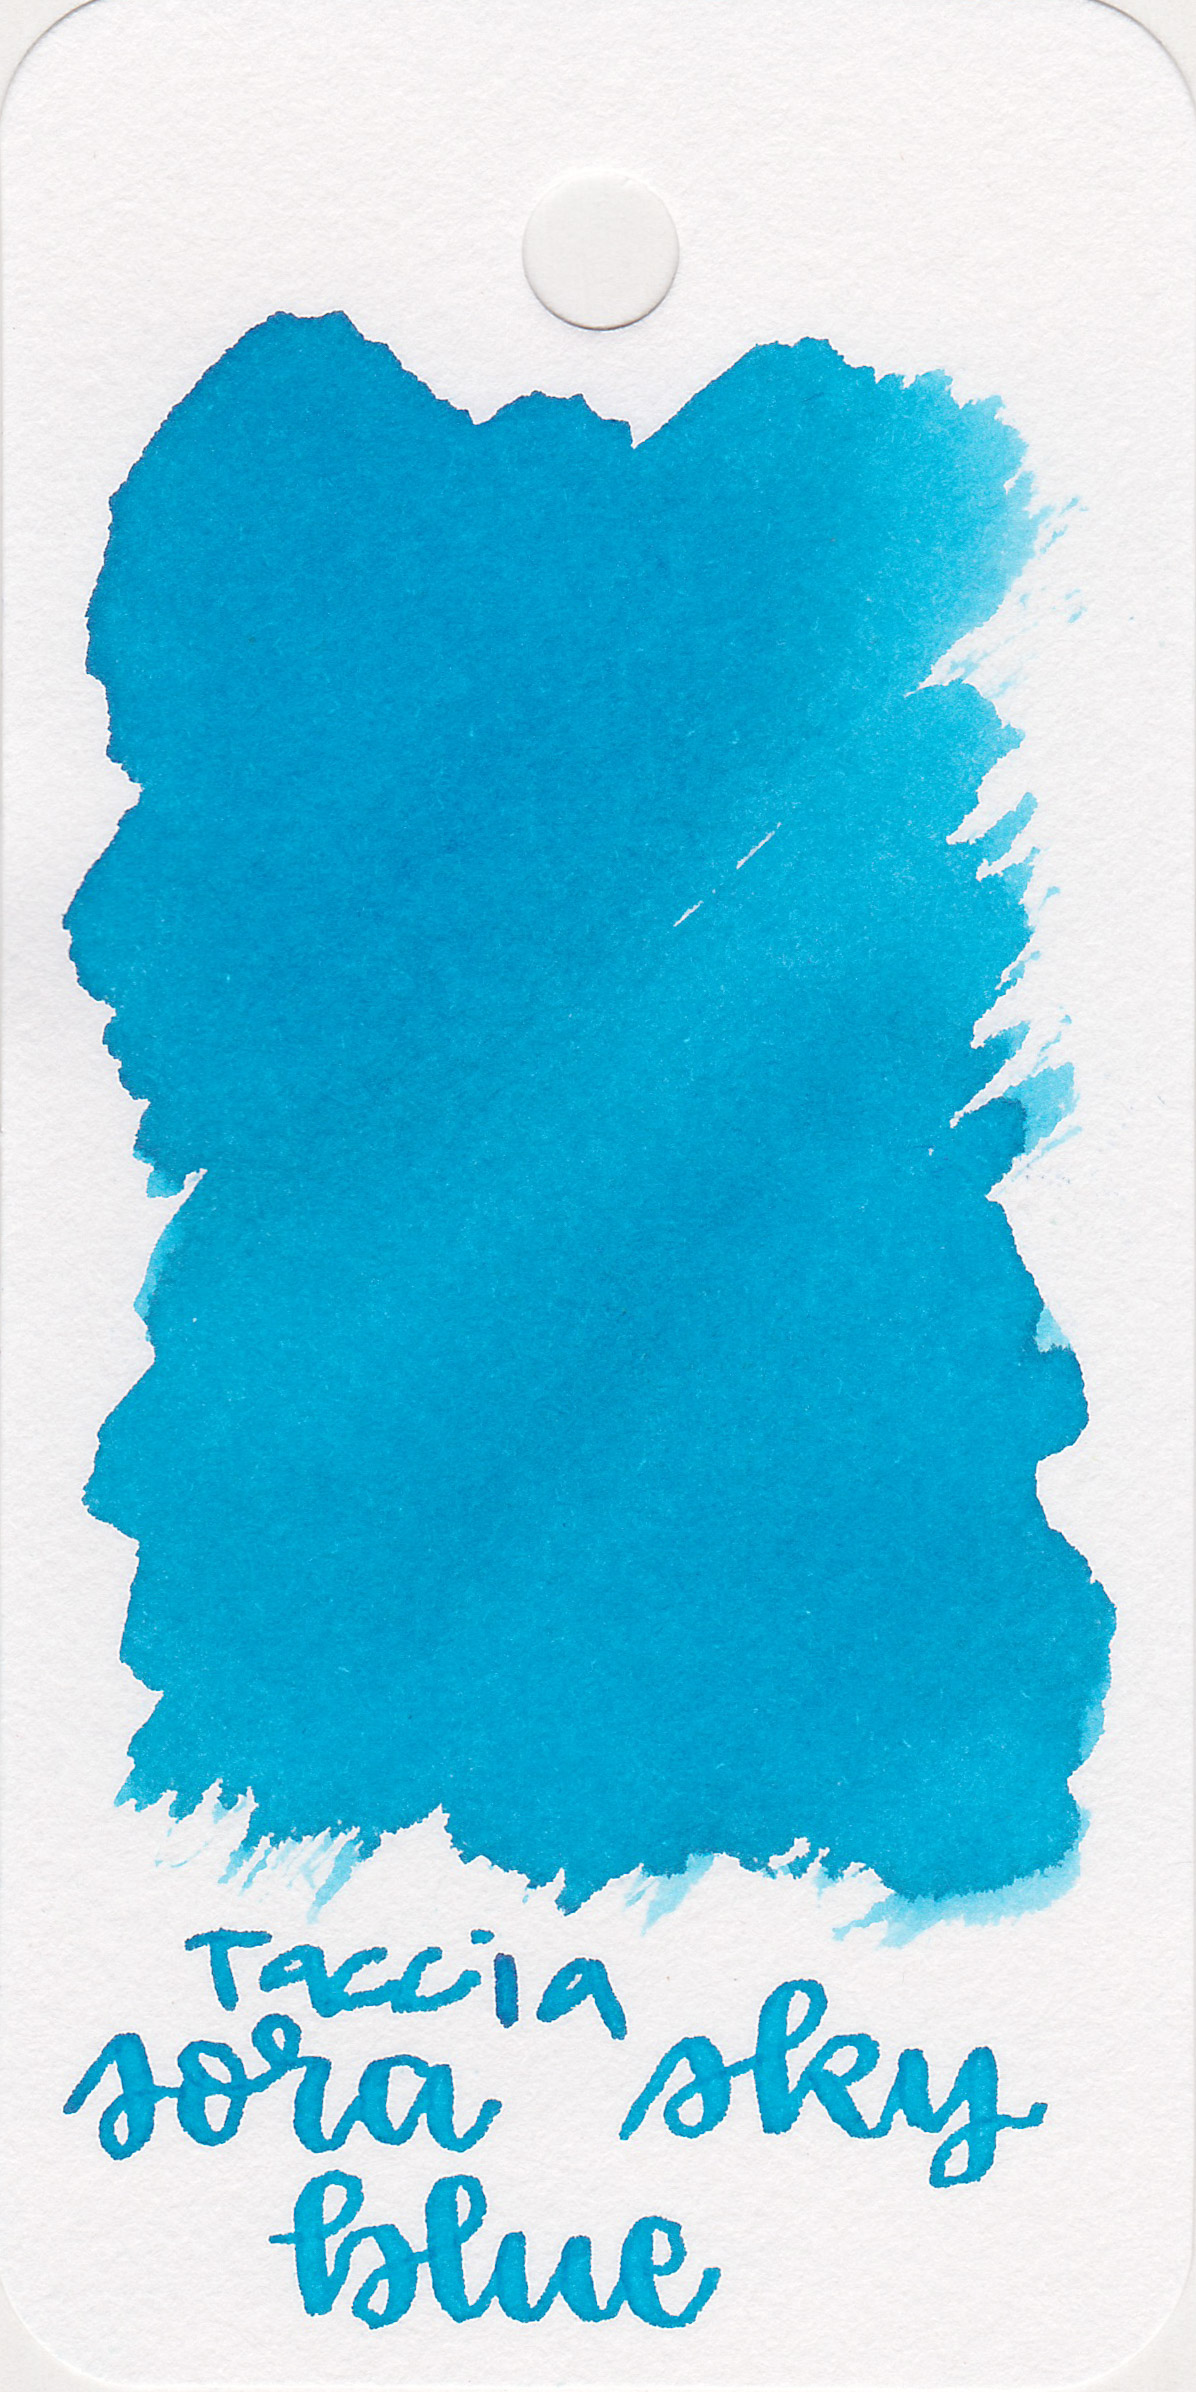 tac-sora-sky-blue-1.jpg